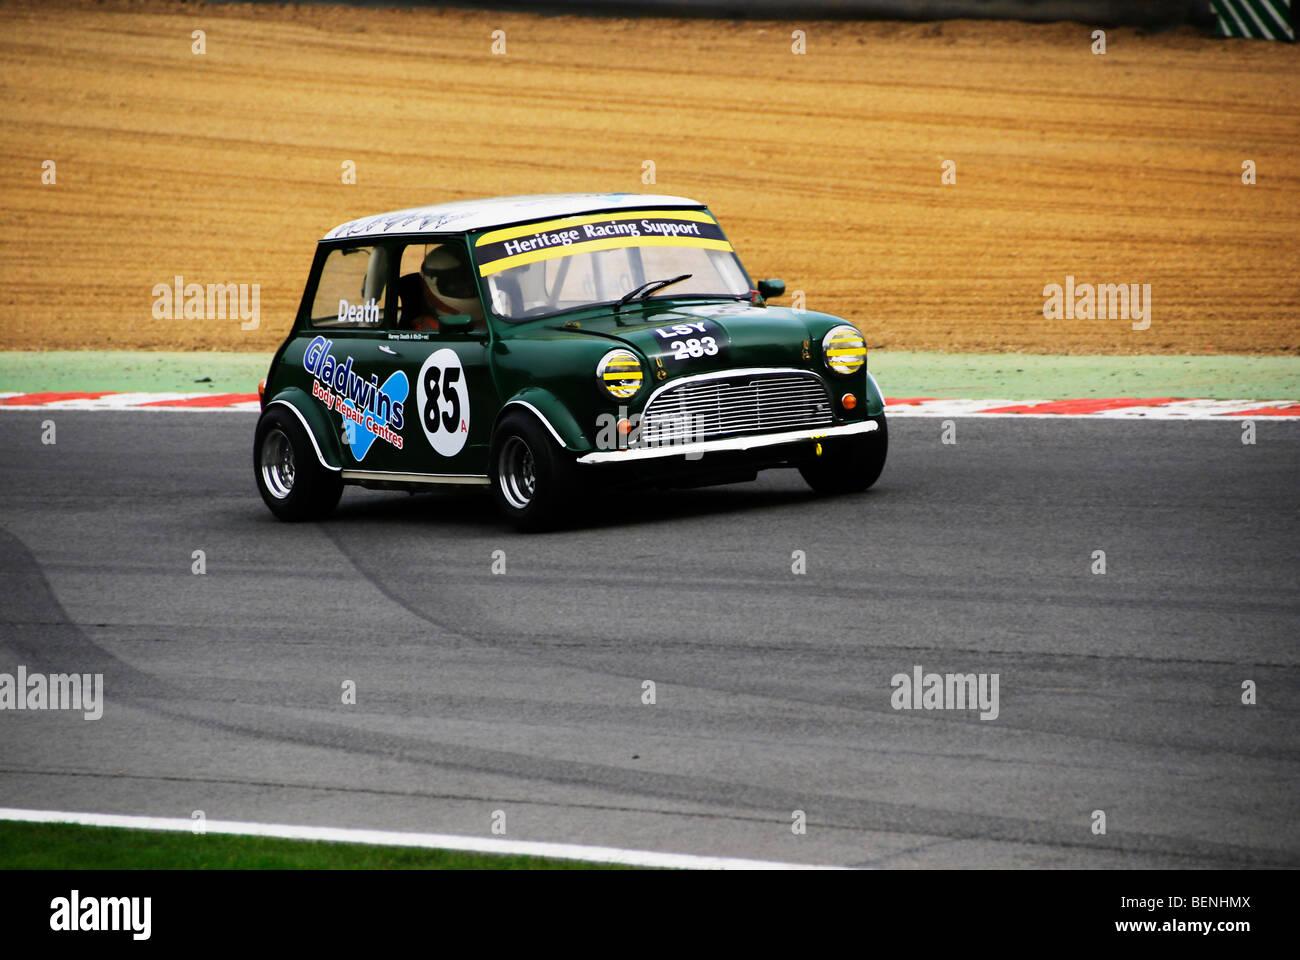 A vintage Austin Mini at Brands Hatch Kent England - Stock Image